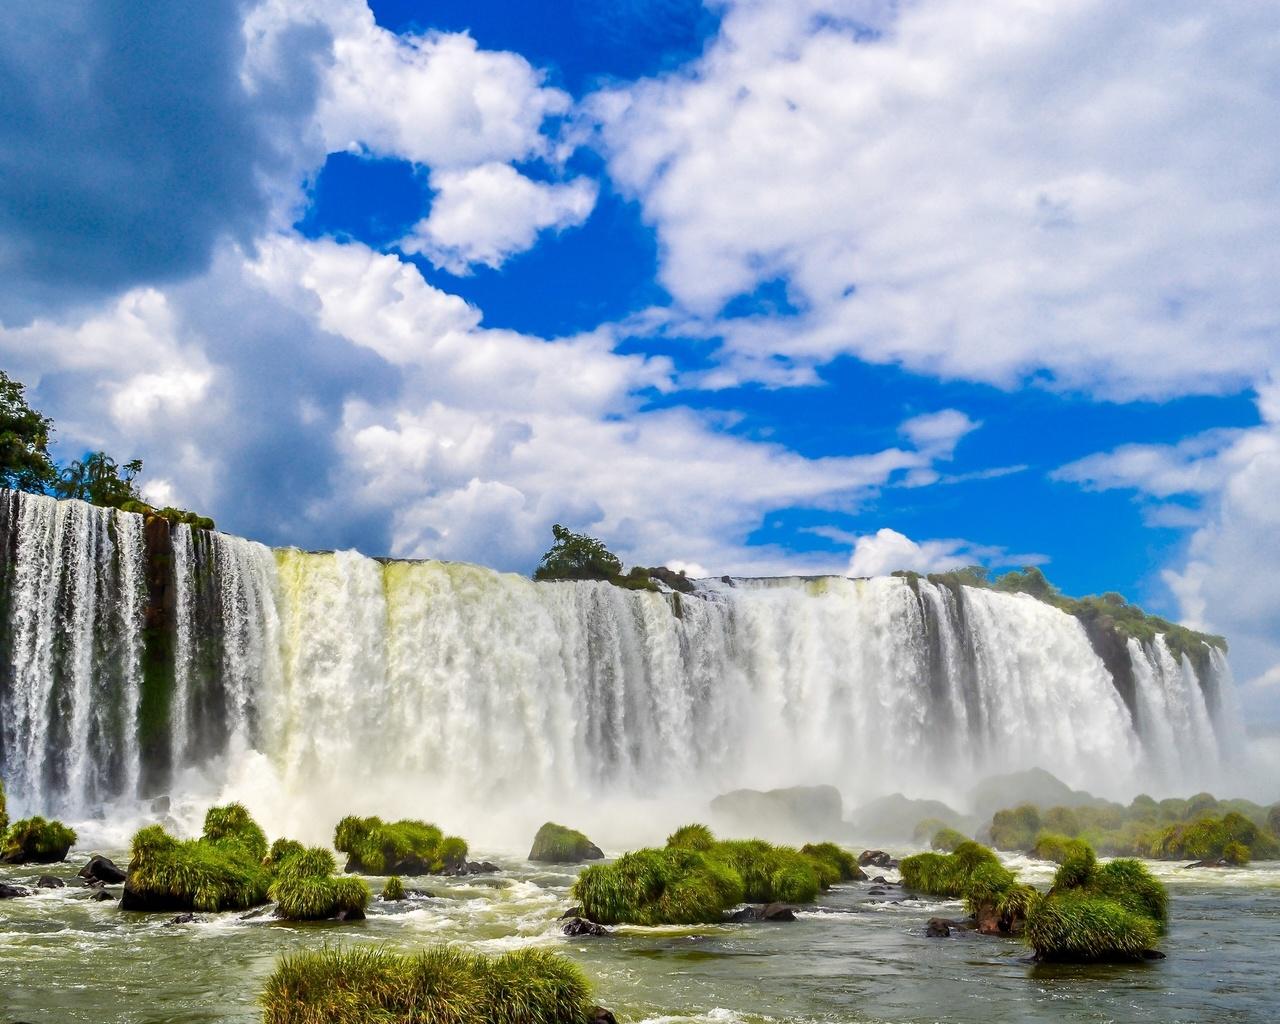 iguazu falls, brazil, водопады, игуасу, бразилия, панорама